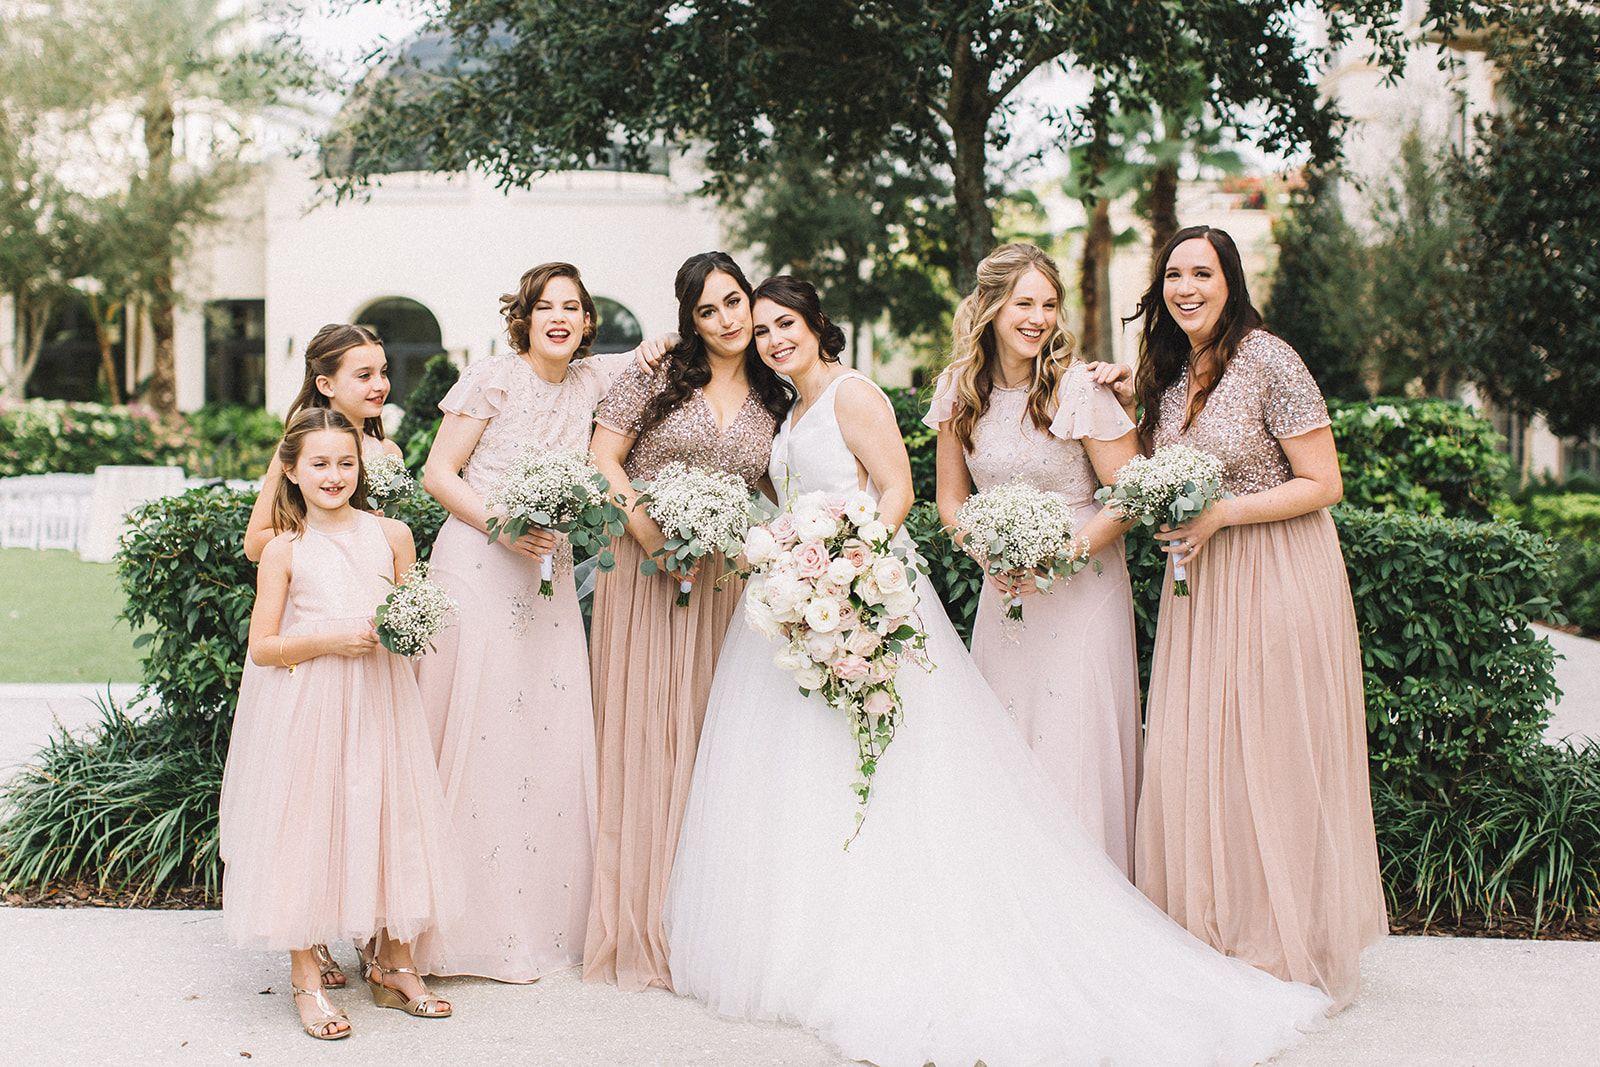 Bluegrass Chic Miranda Grey Photography In 2020 Beautiful Bride Bride Bouquets Bridesmaid Bouquet